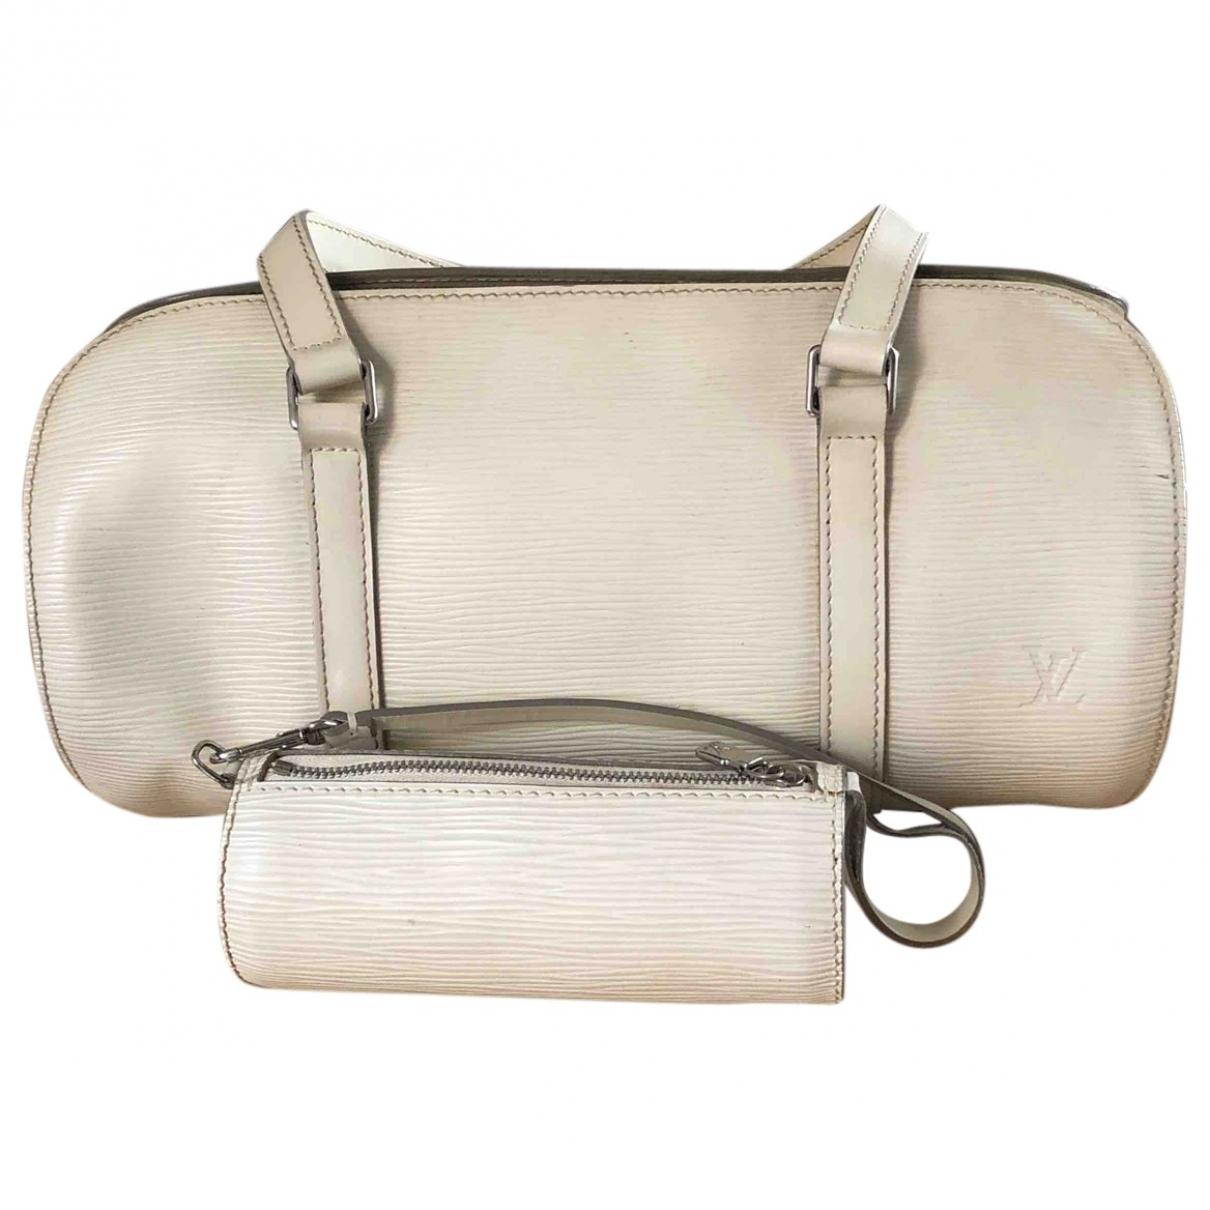 Louis Vuitton Soufflot White Leather handbag for Women \N